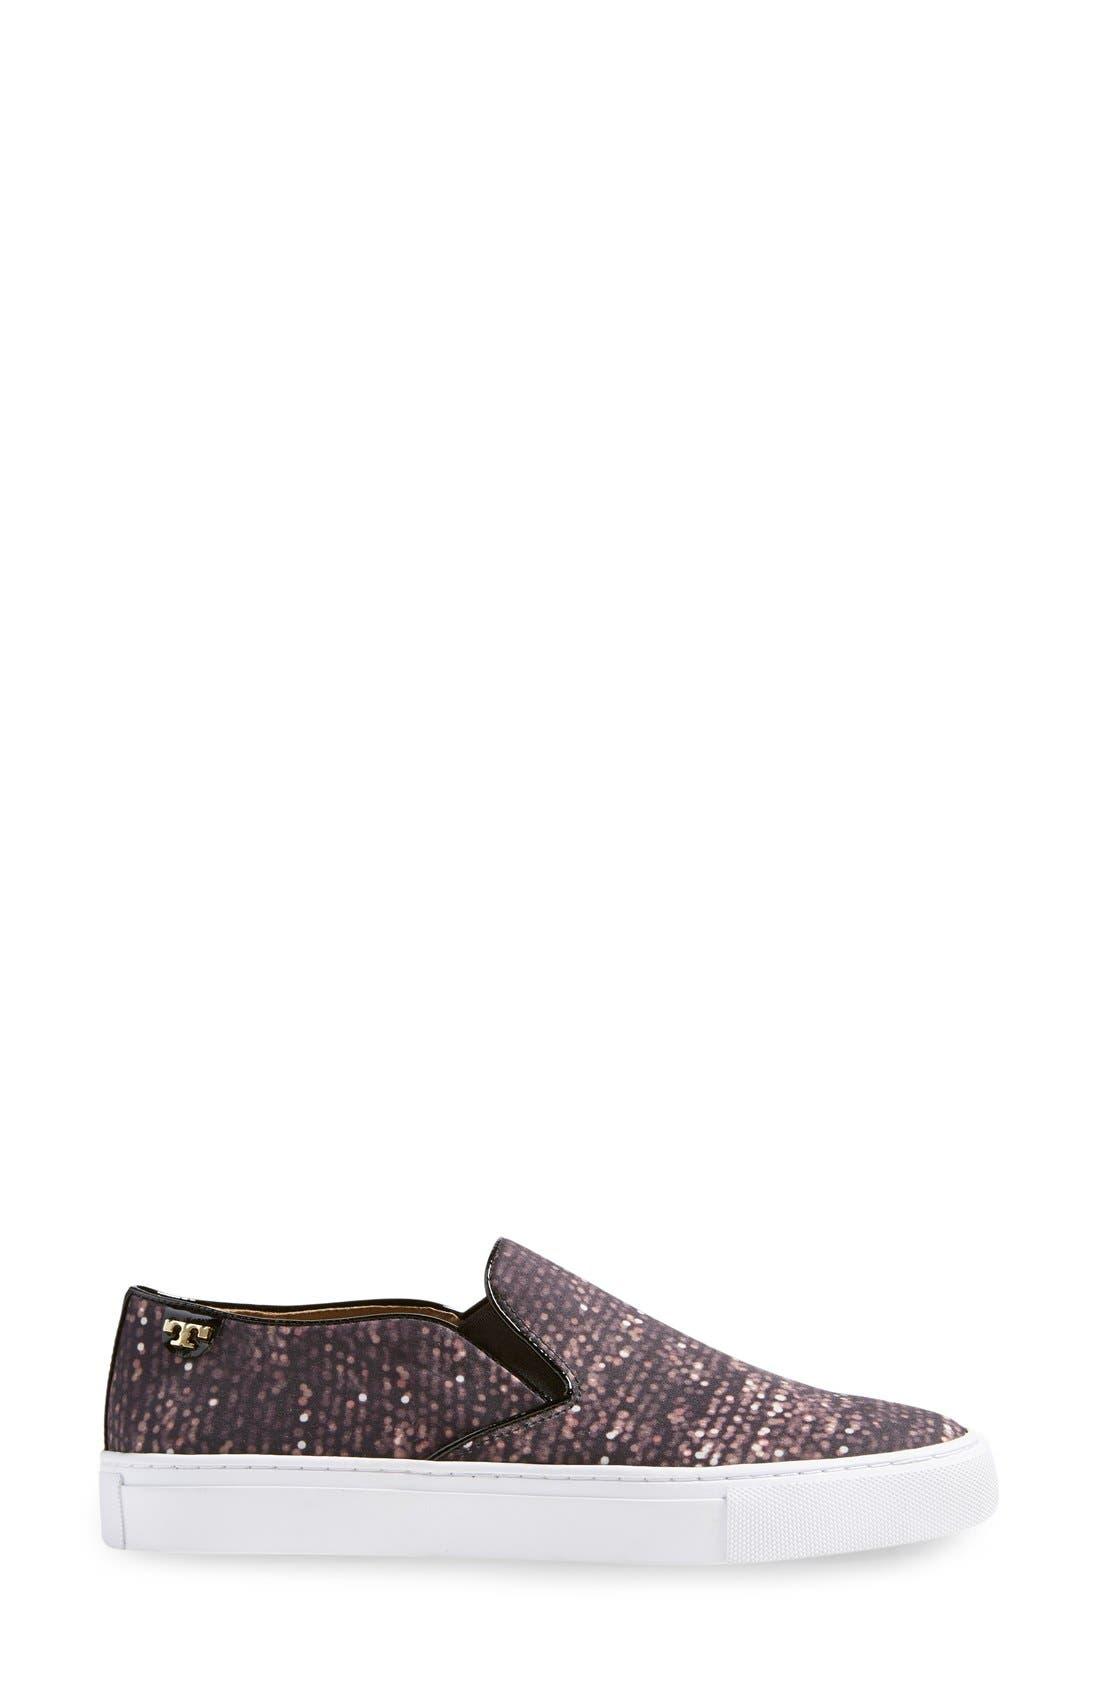 Alternate Image 4  - Tory Burch Print Slip-On Sneaker (Women)